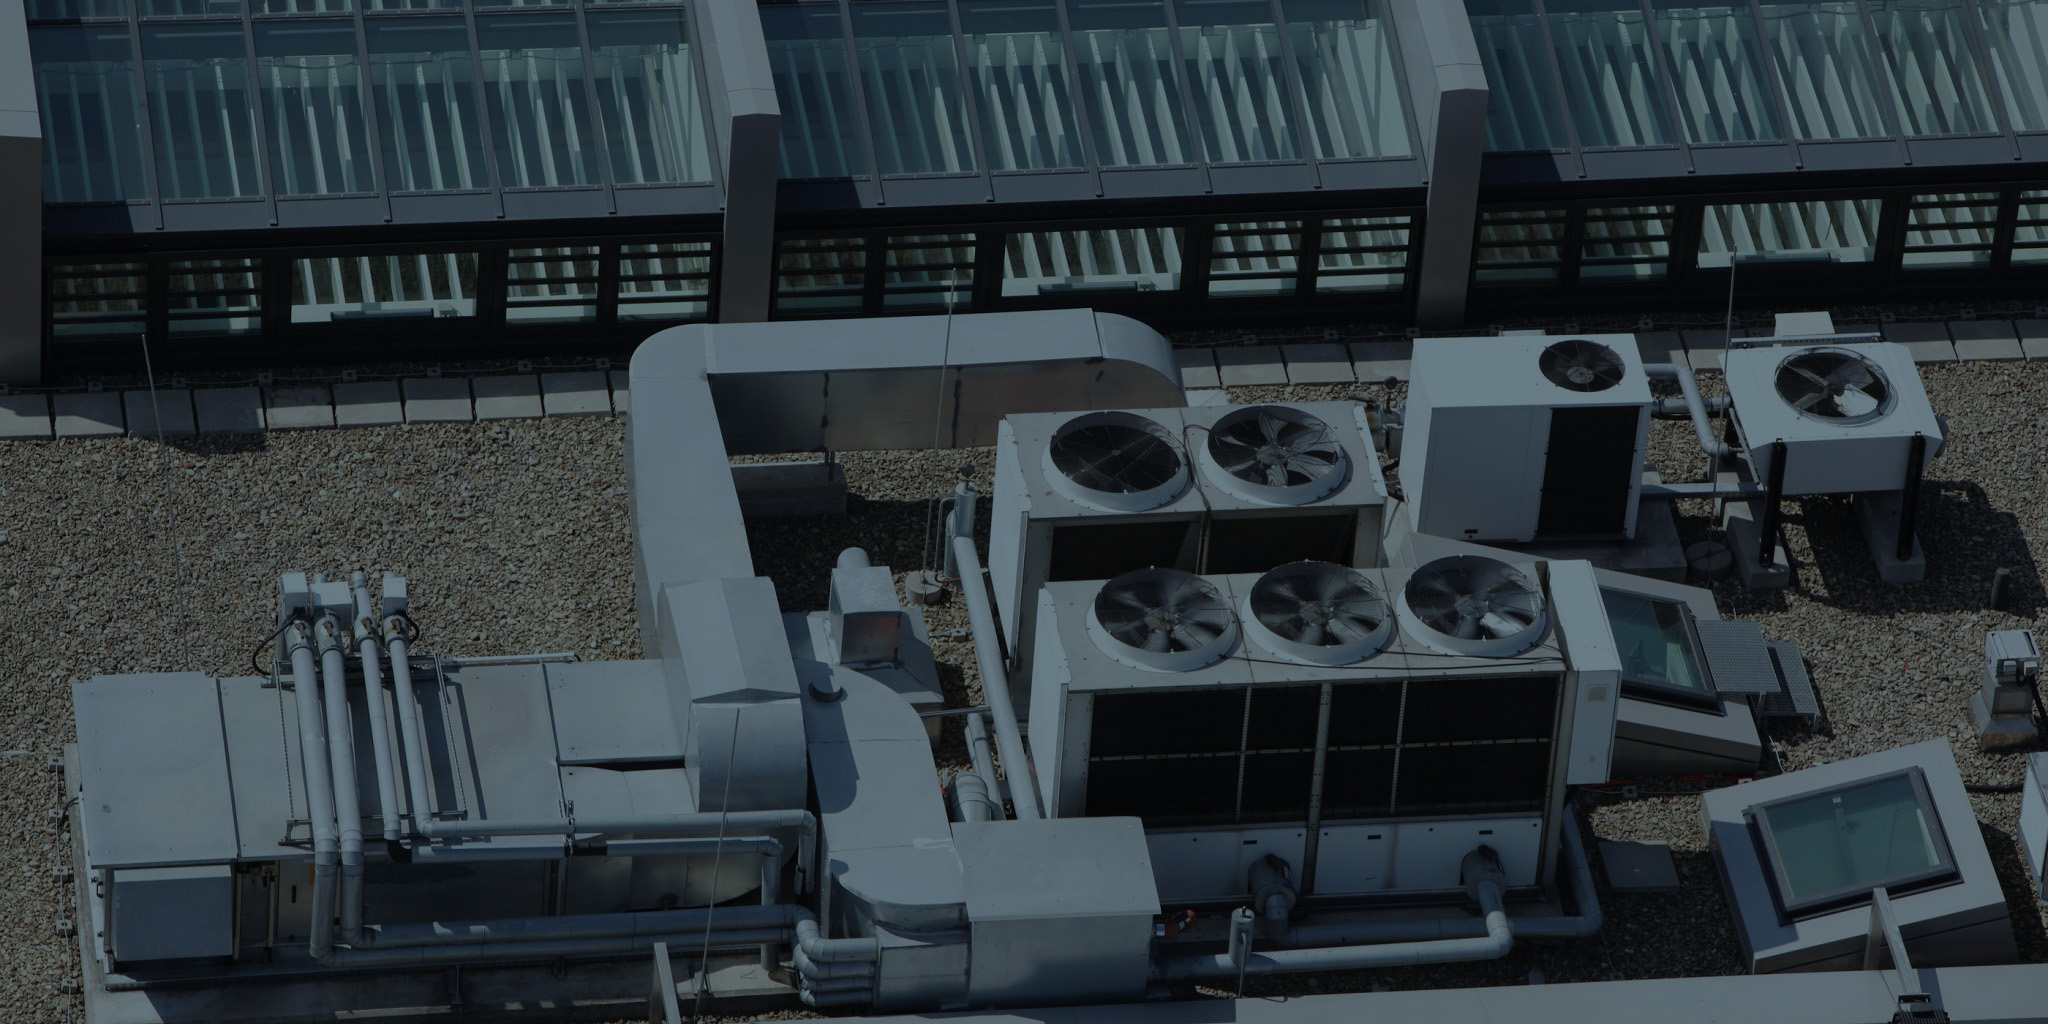 bigstock-Air-conditioning-equipment-3224